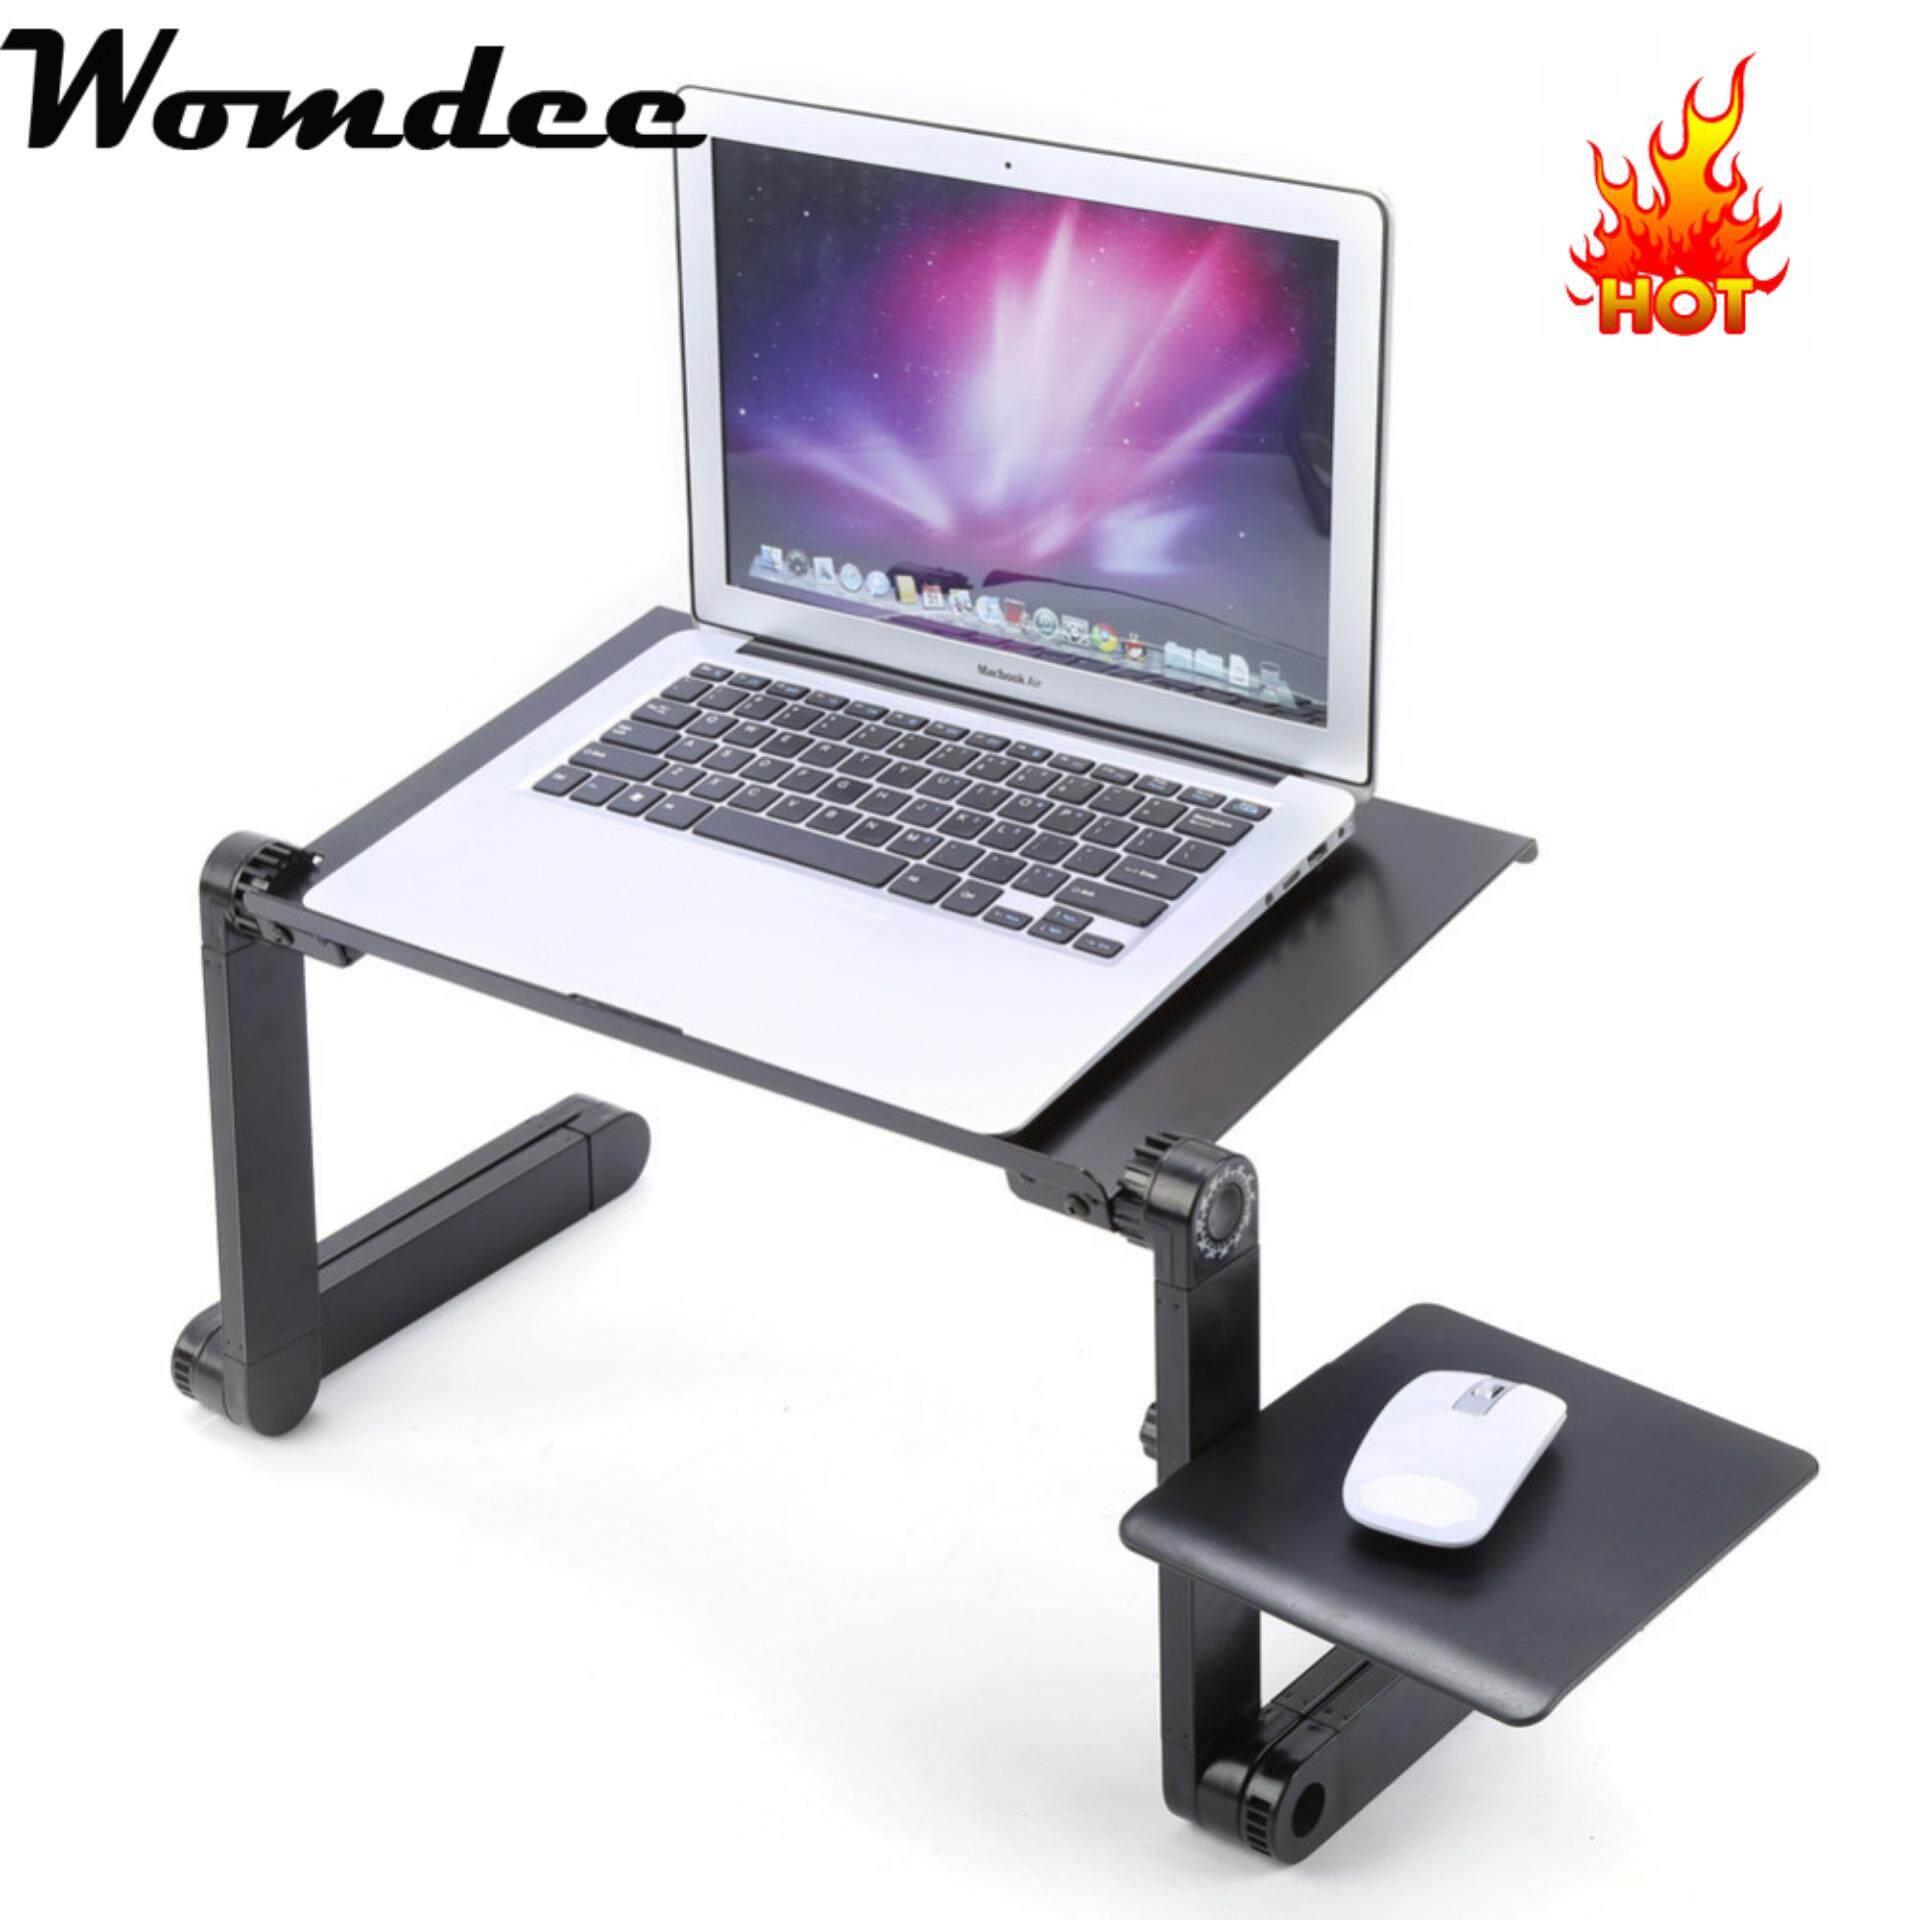 E Table T04 Meja Laptop Lipat Portable Cooling Pad Fan Cooler Aimons Kipas Desk Car Womdee Aluminum Stand With Adjustable Mouse Board Ergonomic Design